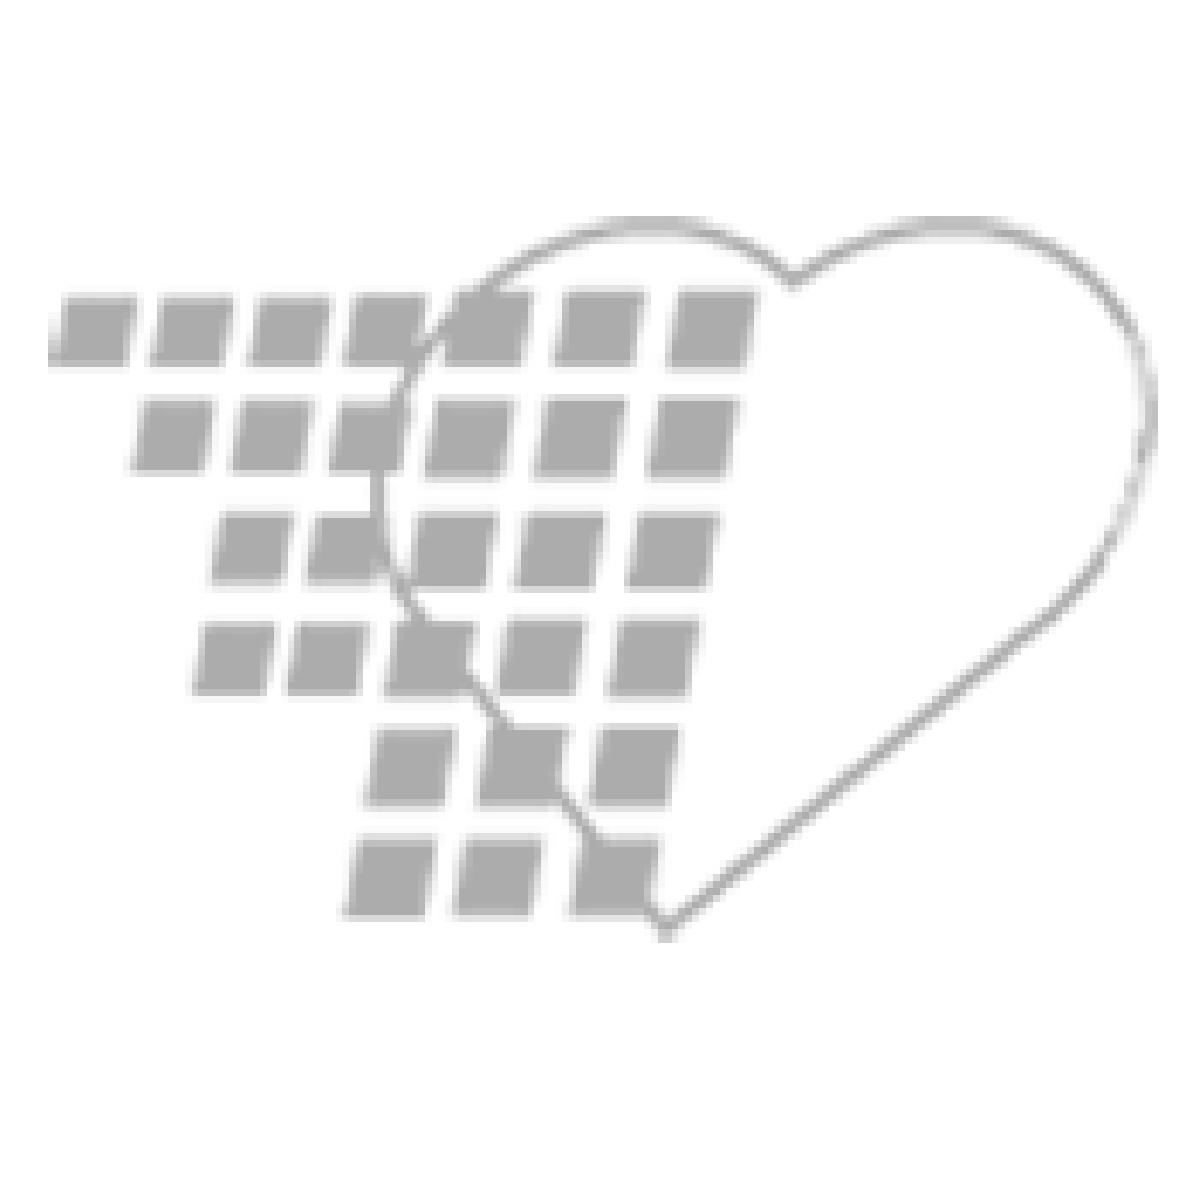 06-93-3004 - Demo Dose® NPH Insuln 100 units/mL 10 mL